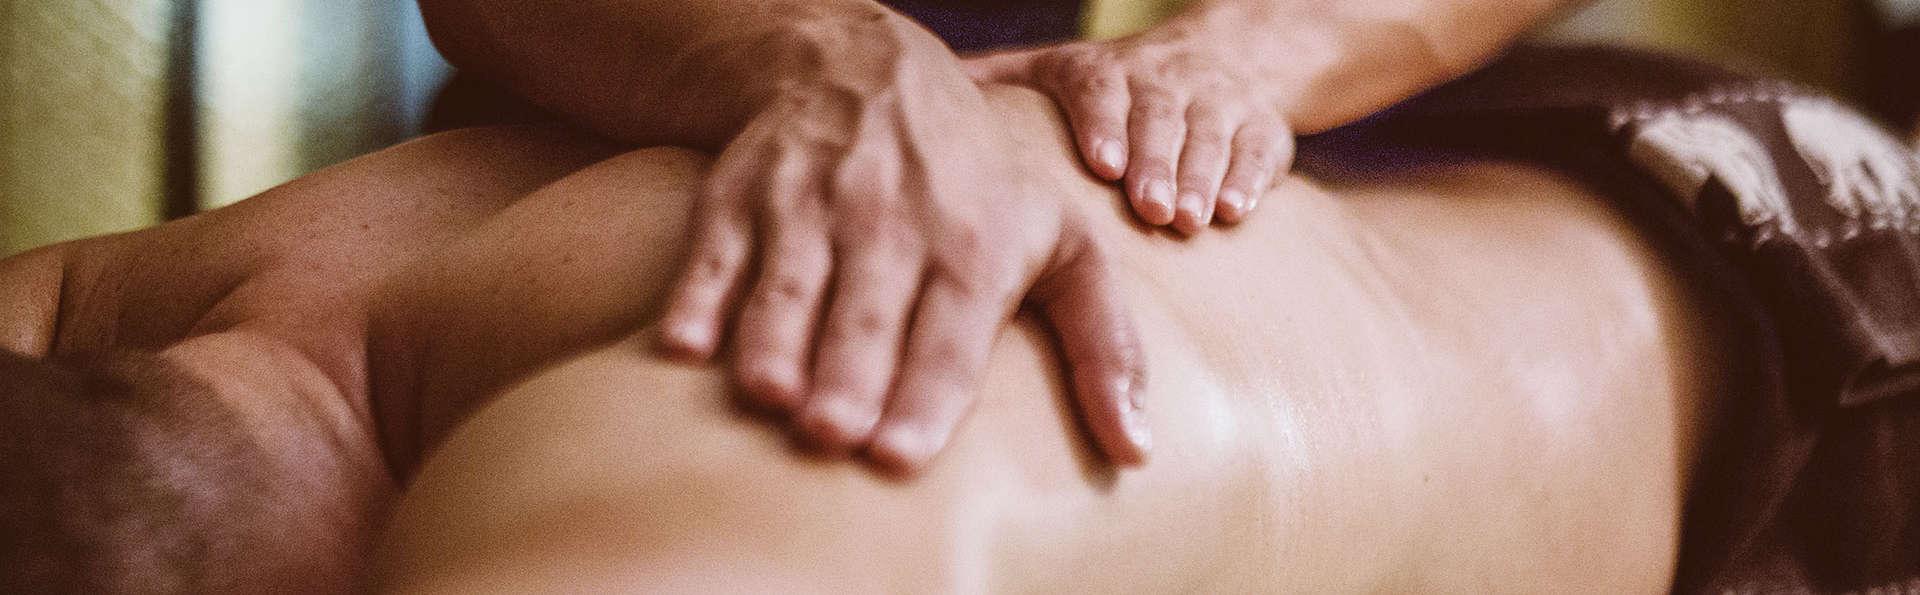 Escapada de relax a Forio d'Ischia con masaje incluido